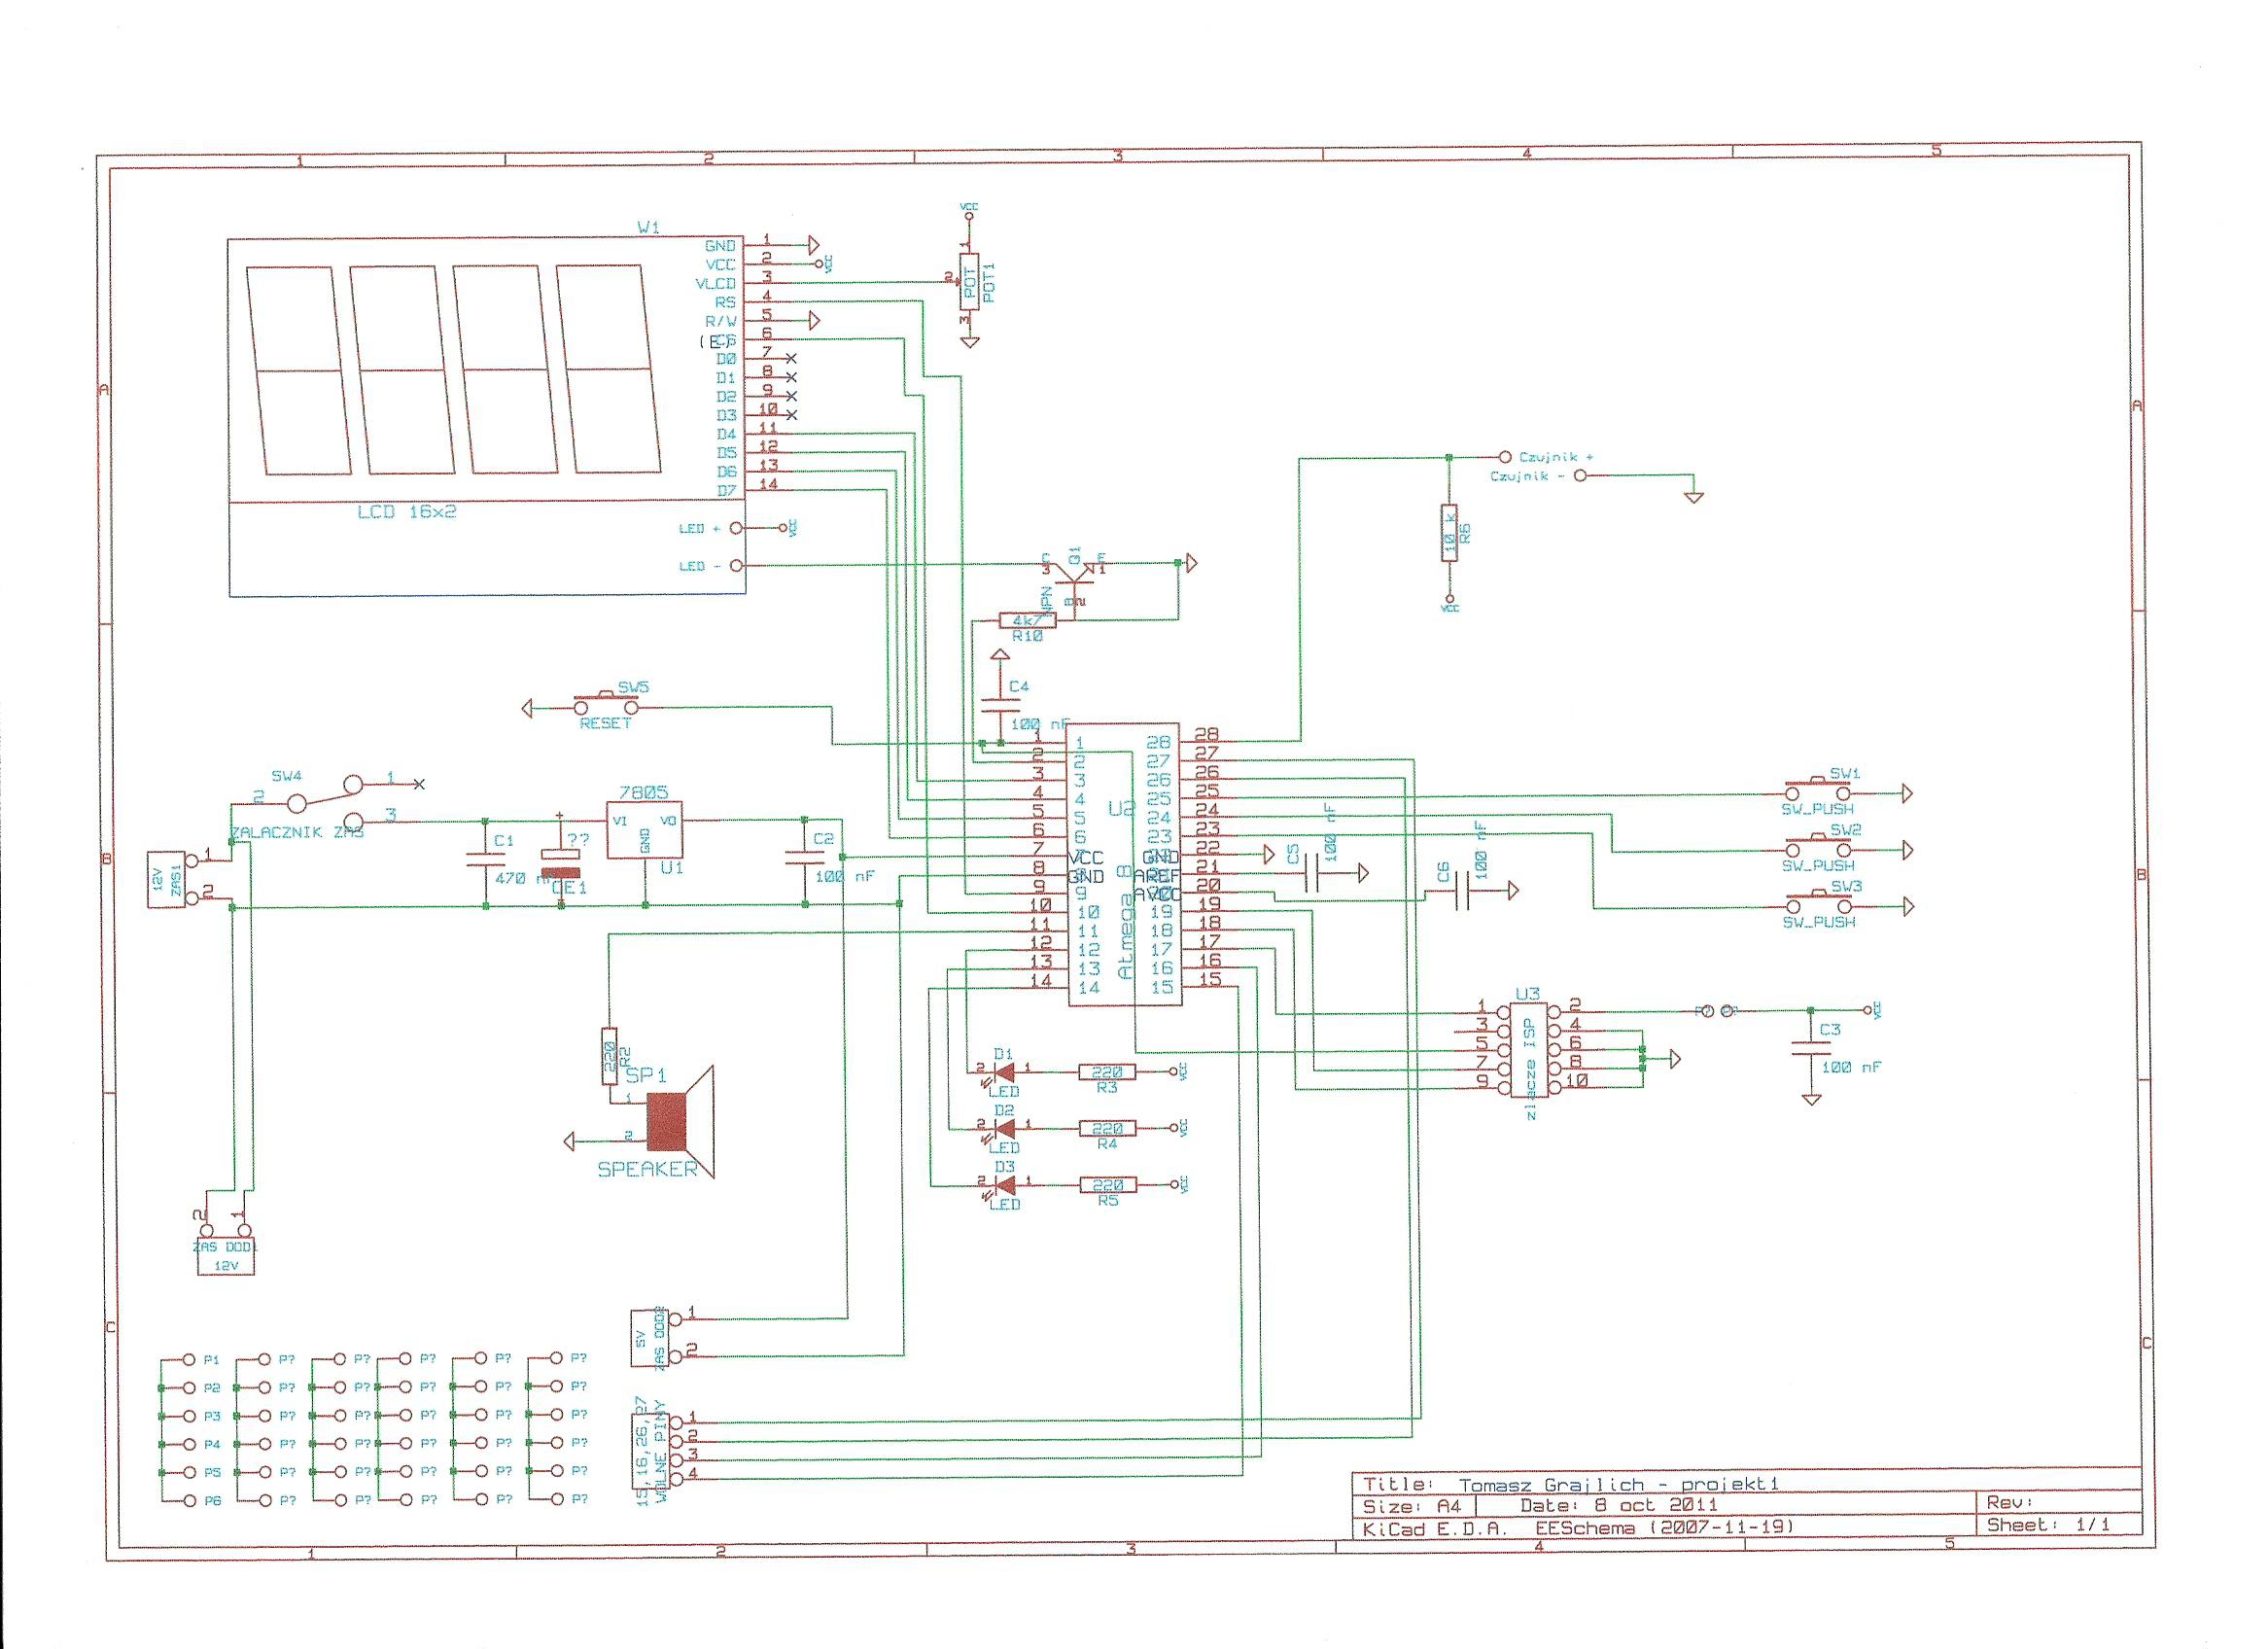 [DIAGRAM_3NM]  Apc 1500 Battery Wiring Diagram - Wiring Diagram Directory | Apc Rbc32 Battery Wiring Diagram |  | wiring diagram pictures